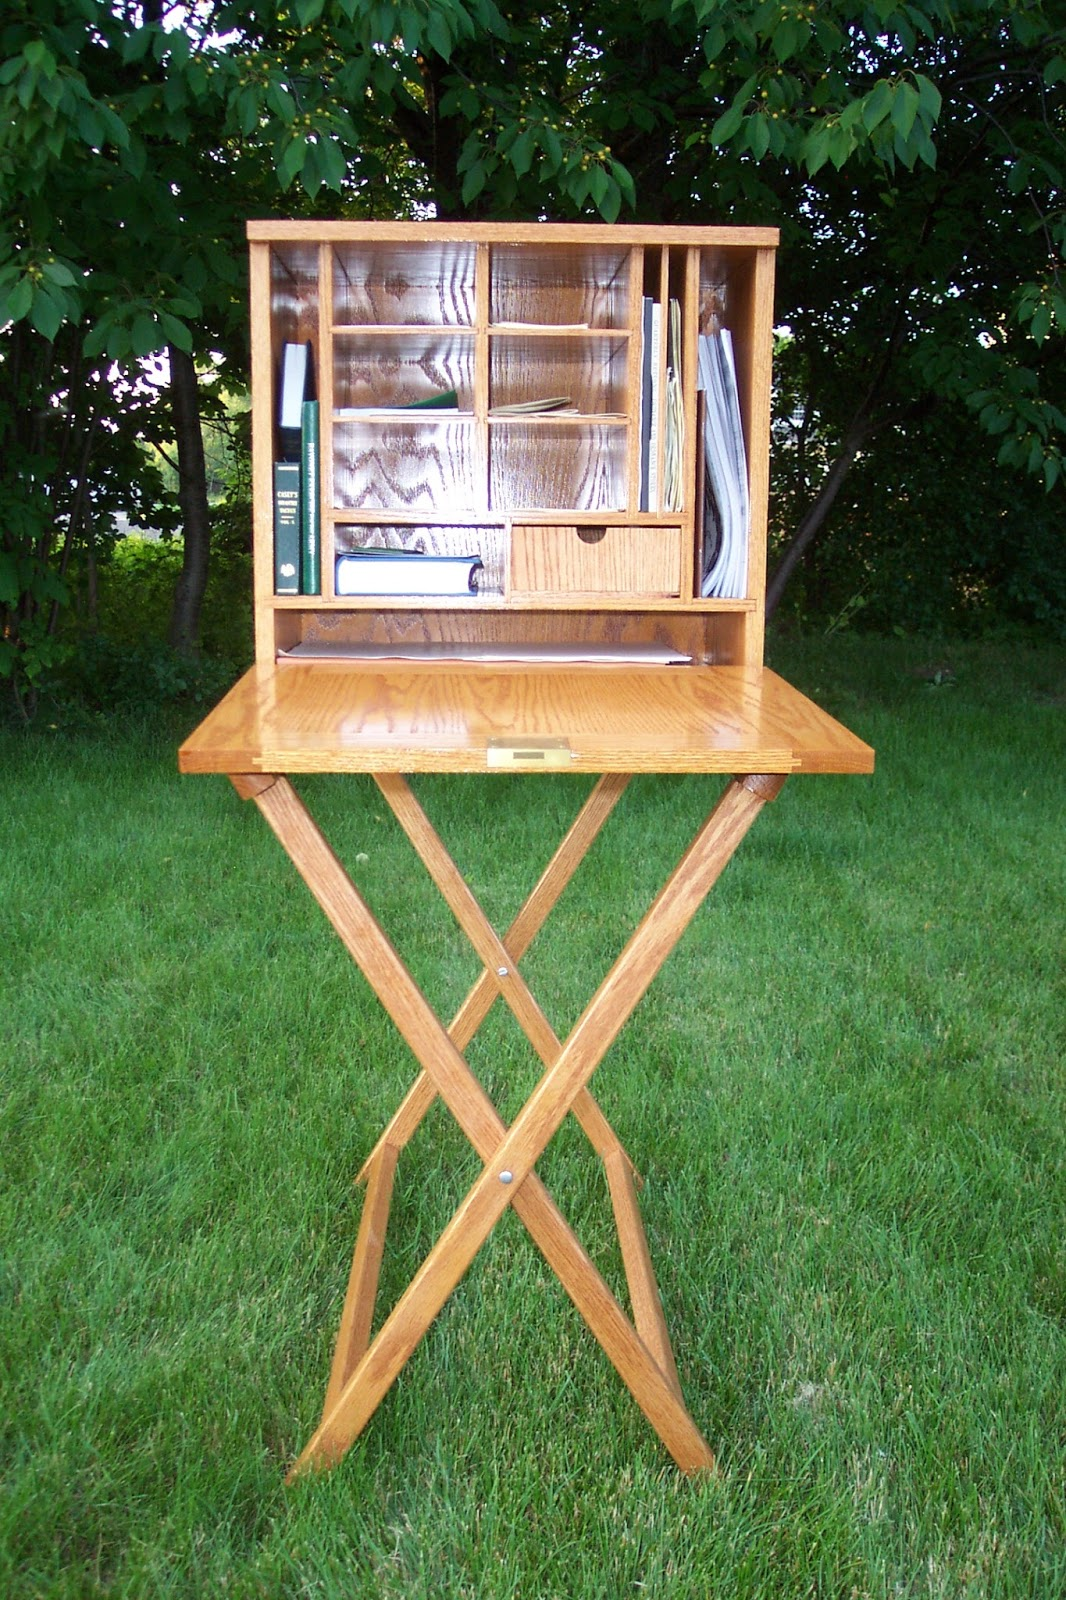 Felix Enterprises' Woodworking Projects: Civil War ...